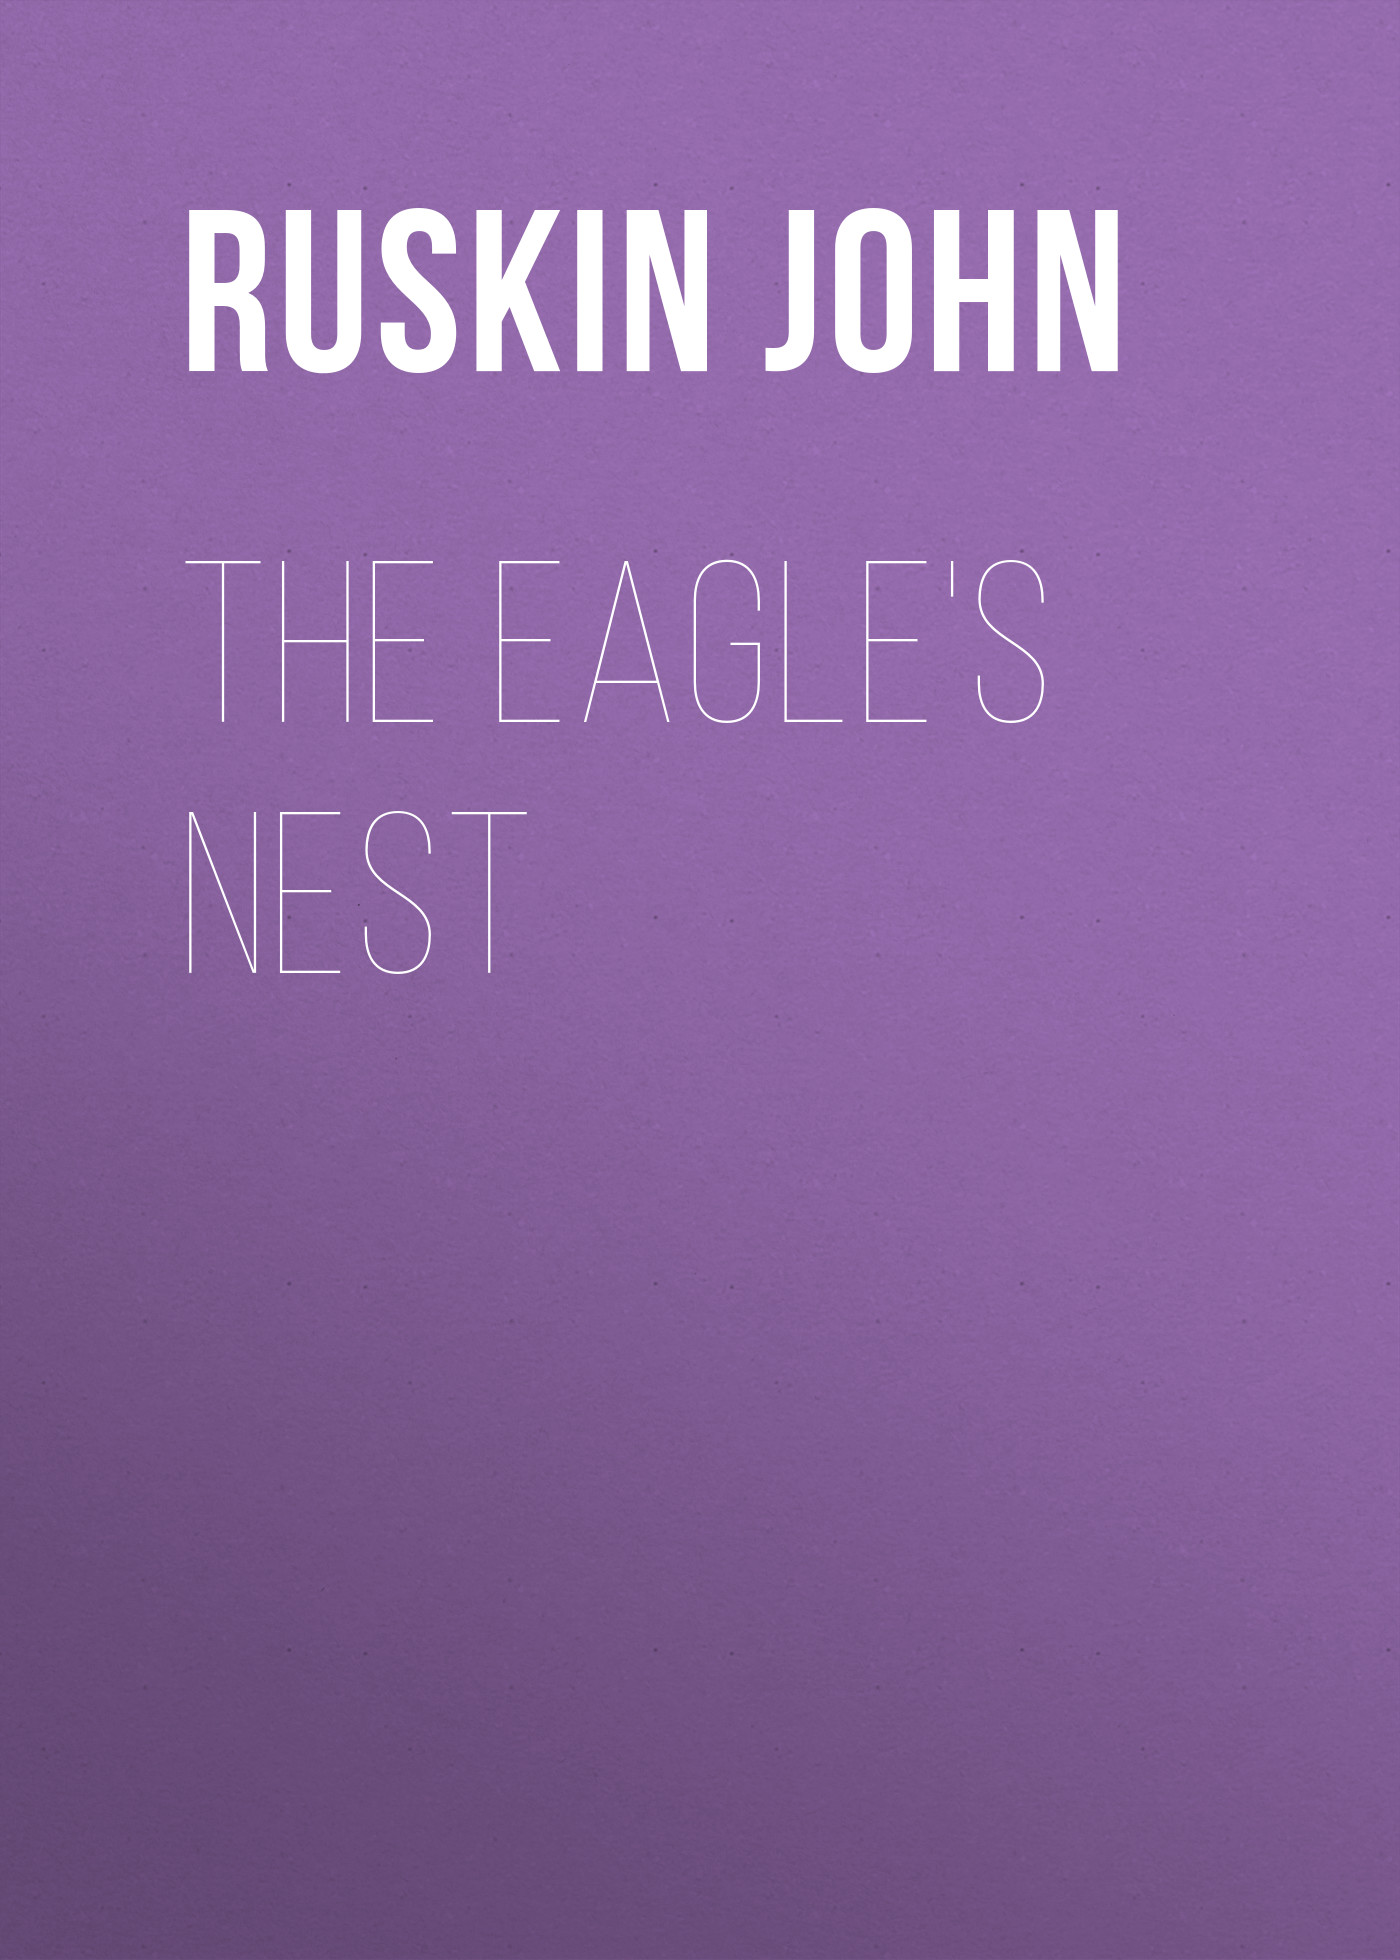 Ruskin John The Eagle's Nest john ruskin fors clavigera